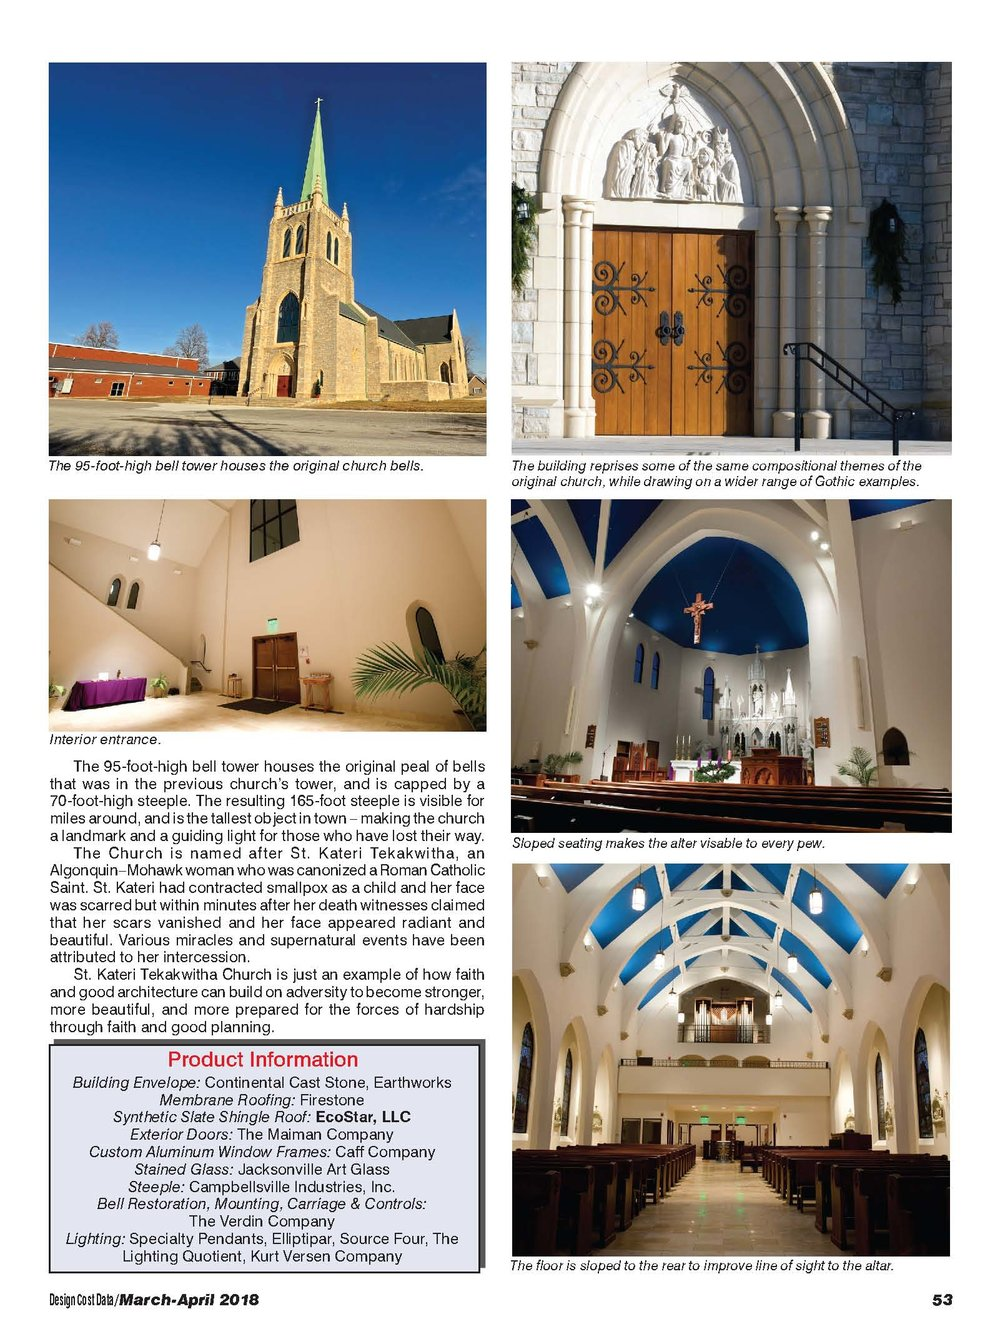 52-54_r1-St Kateri Tekakwitha Church_Page_2.jpg